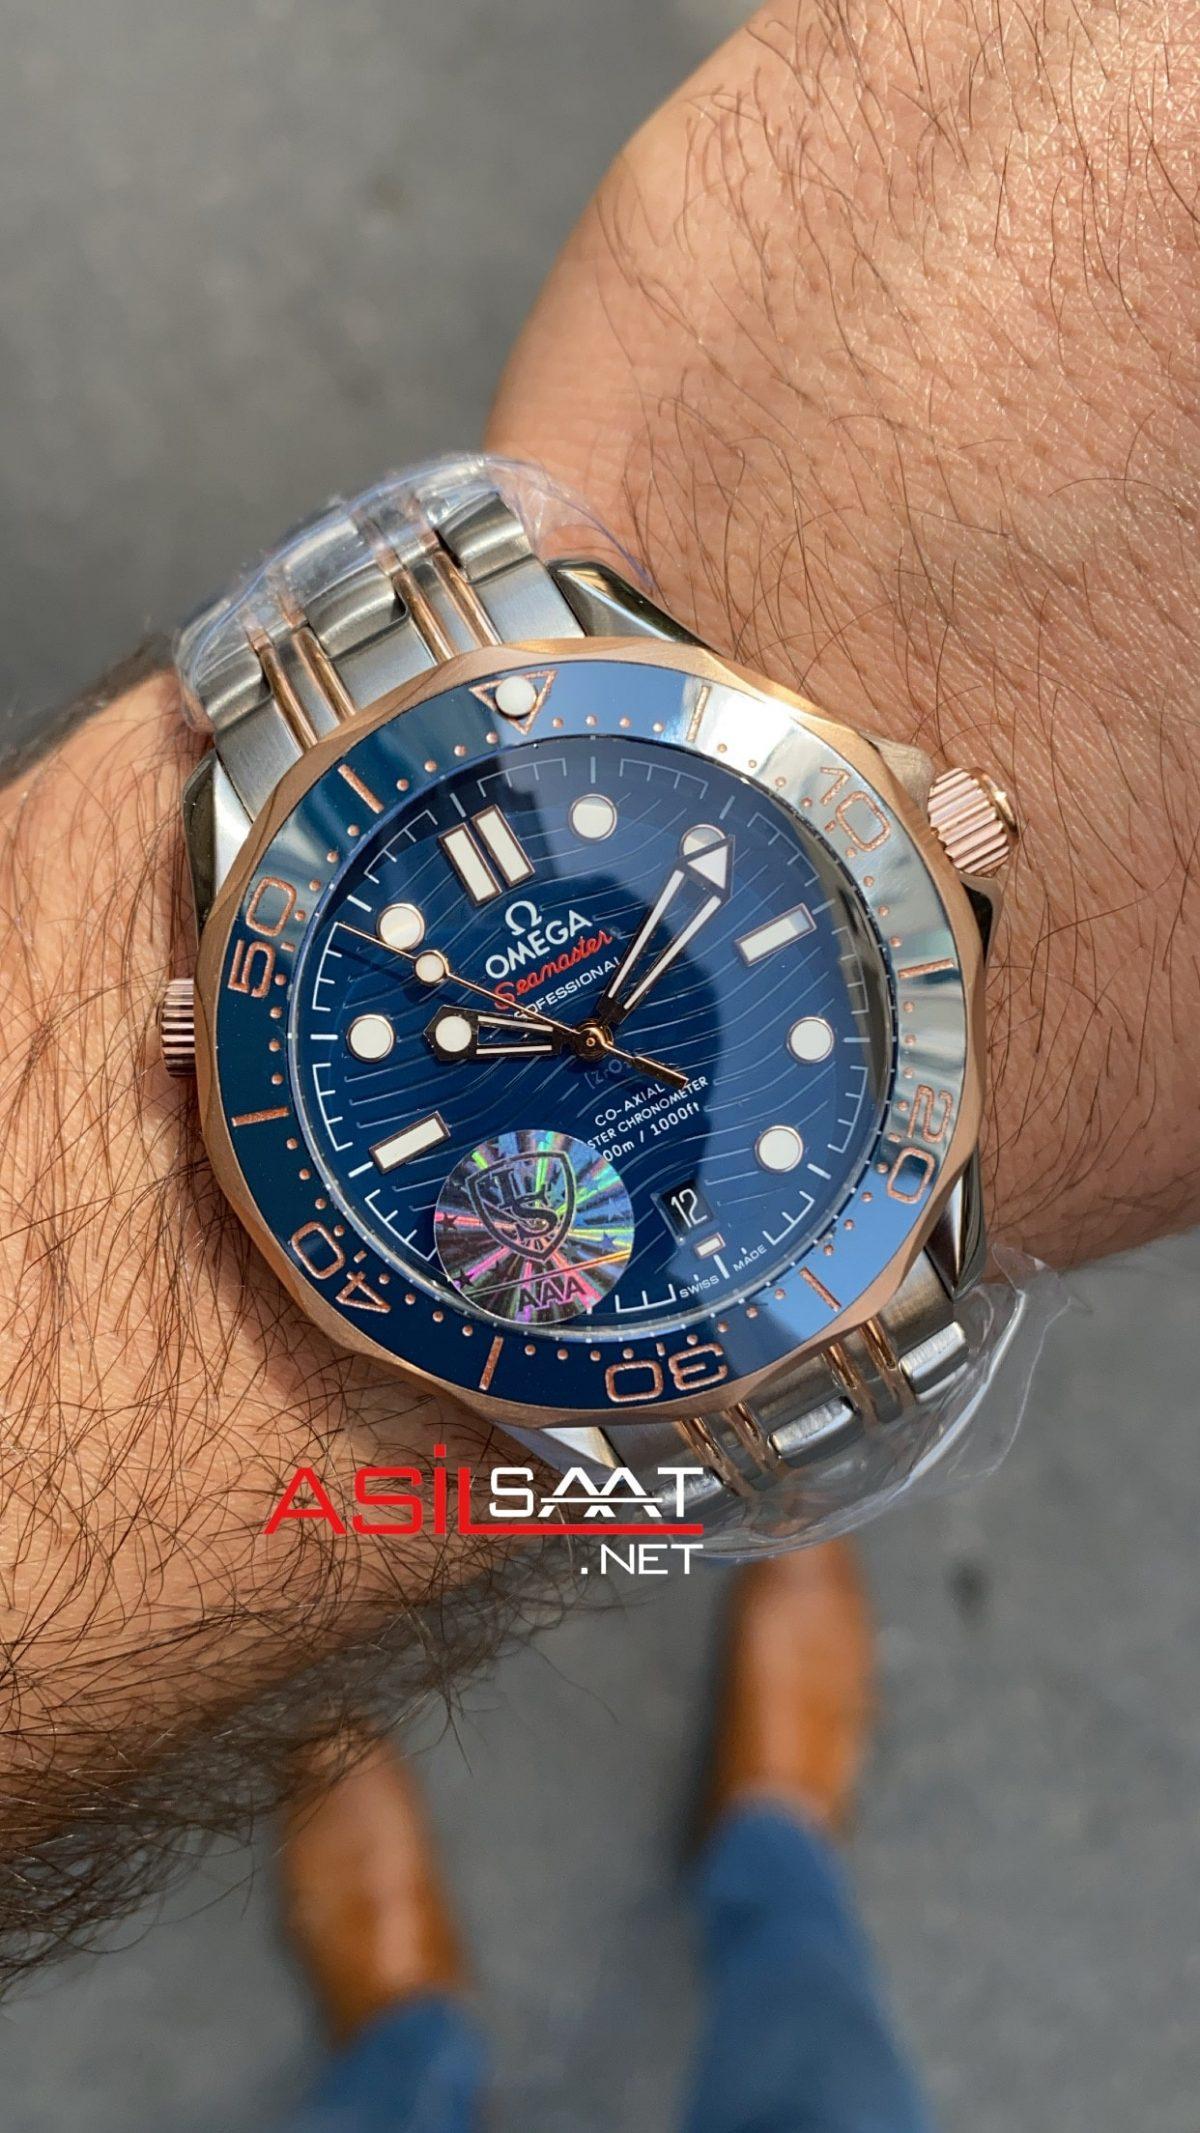 OMEGA Seamaster Diver 300M Silver Rosegold Replika Saat OSD007